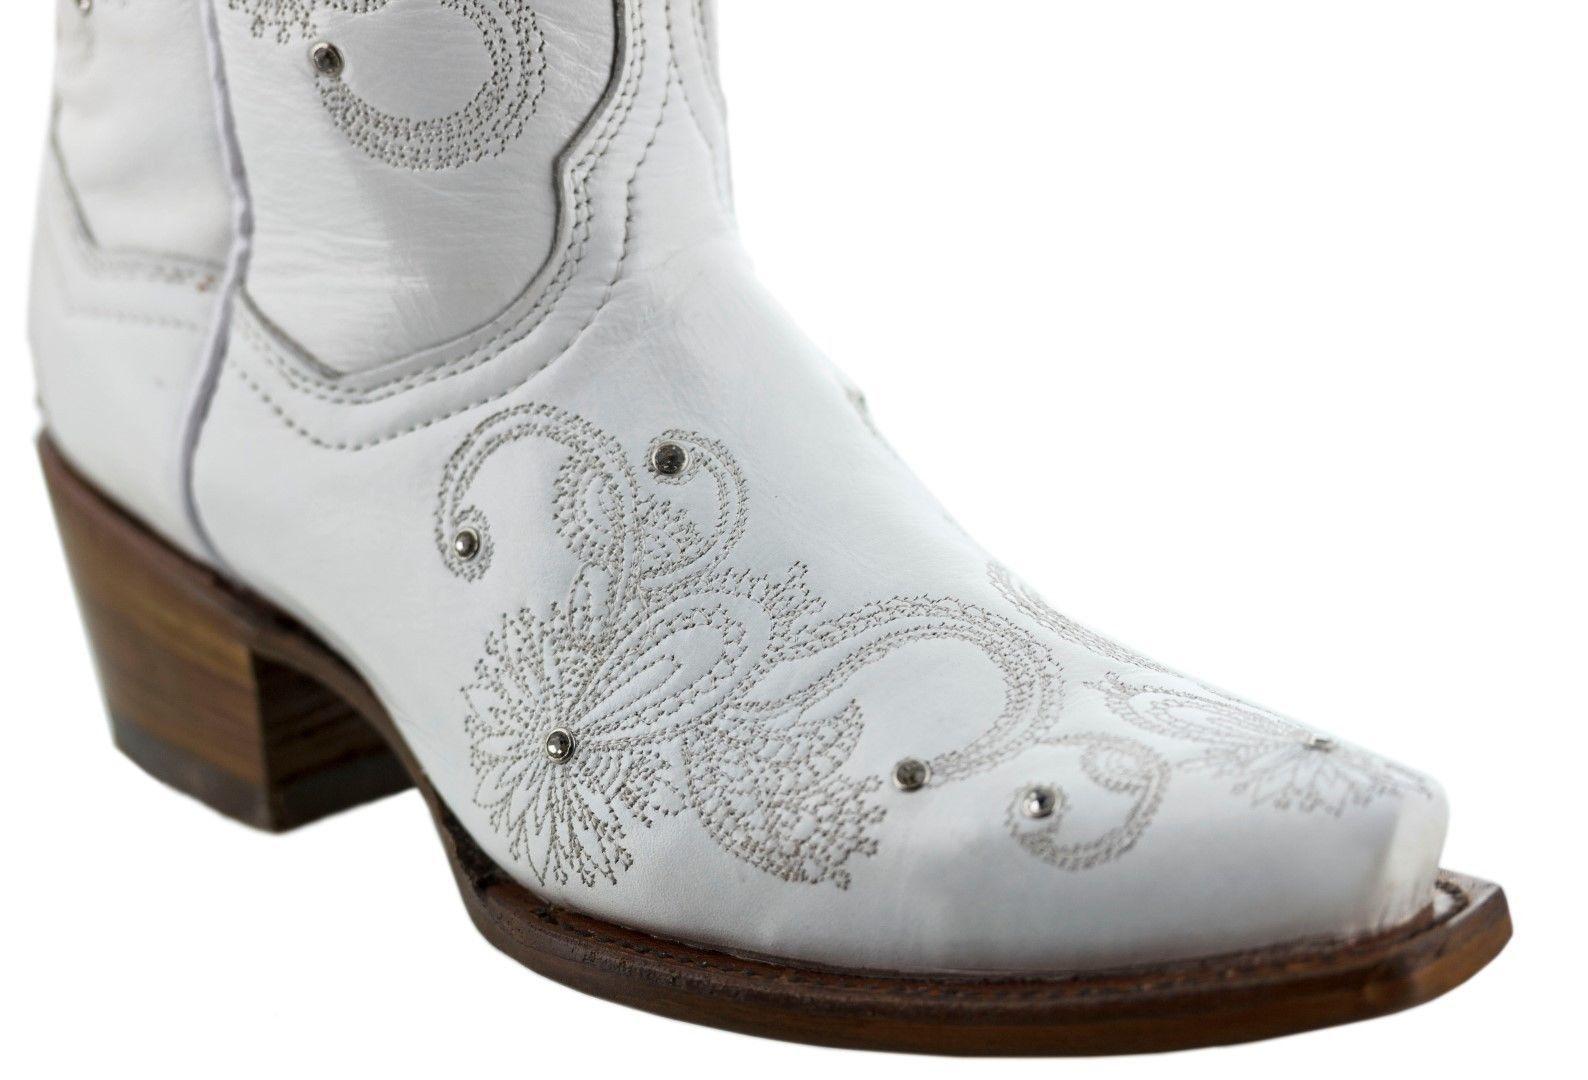 5066c6932b3 Womens Full White Gold Western Wedding Bride and 30 similar items